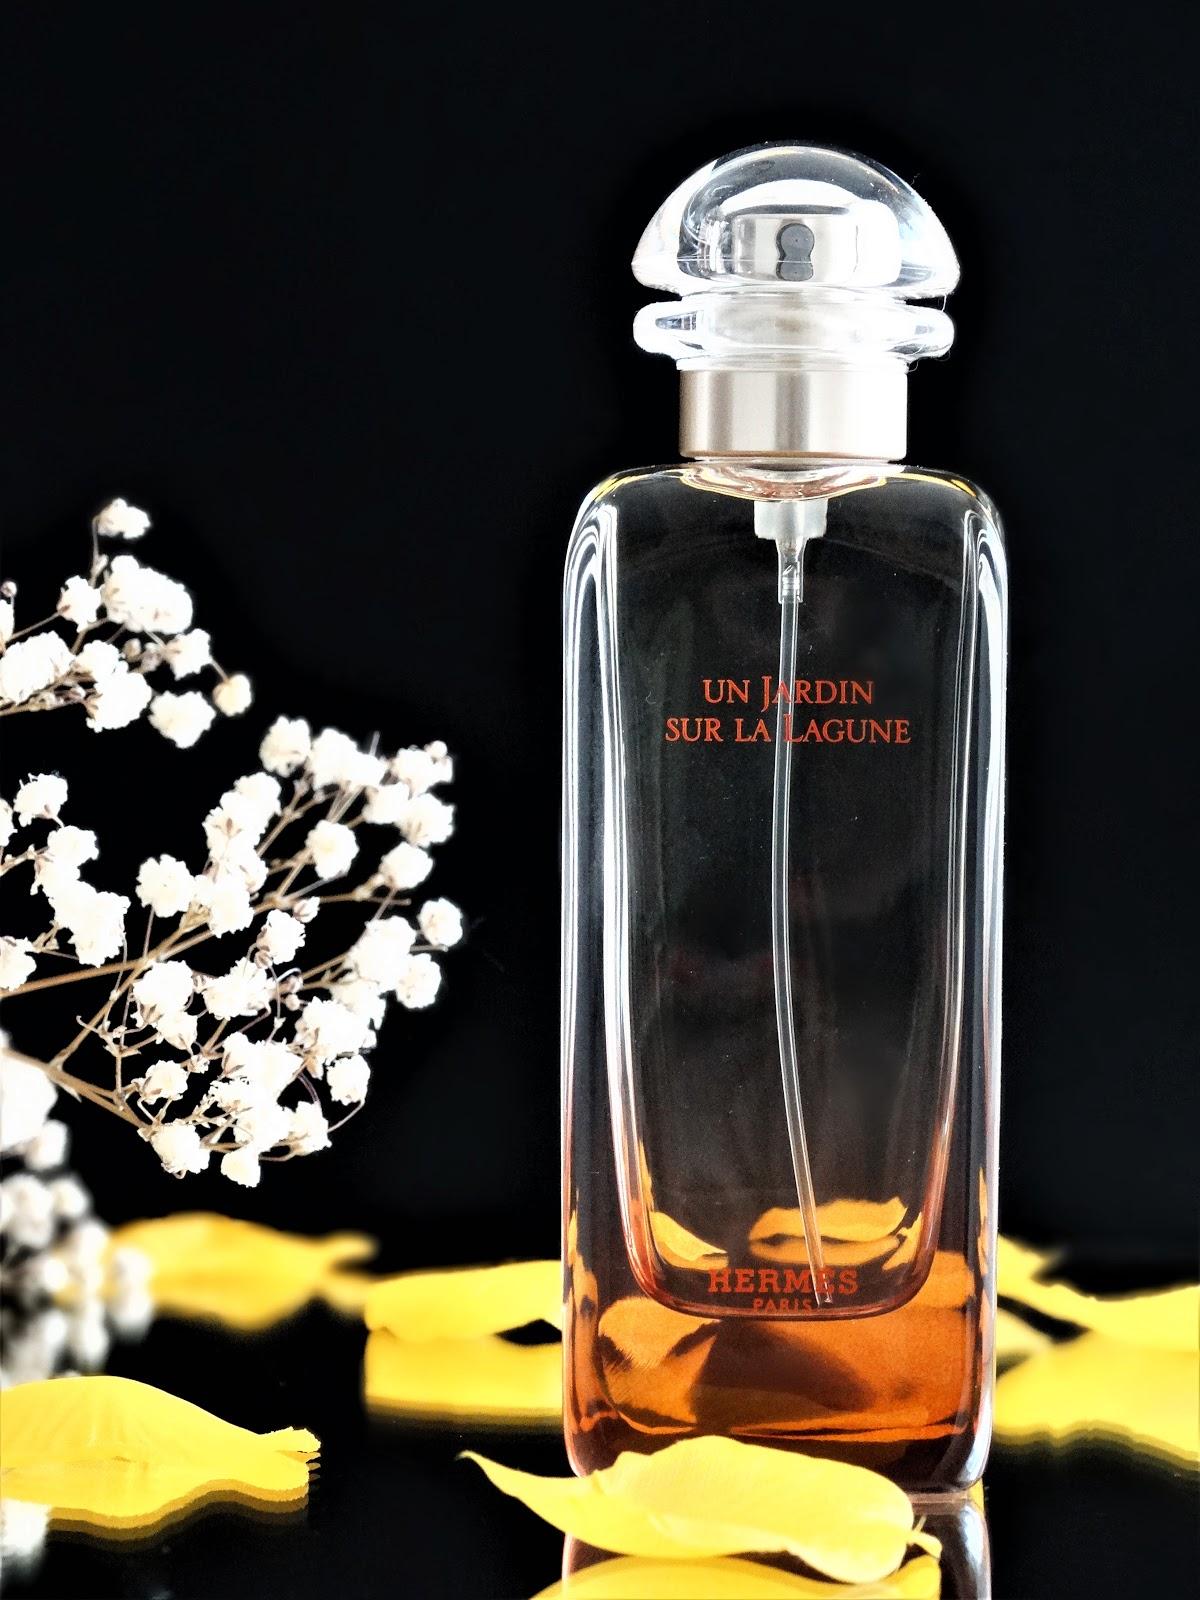 Gorgeous Tiny Parfum 12 Homme Hermes Avis Top Vgsmqzup uPZXiOkTw